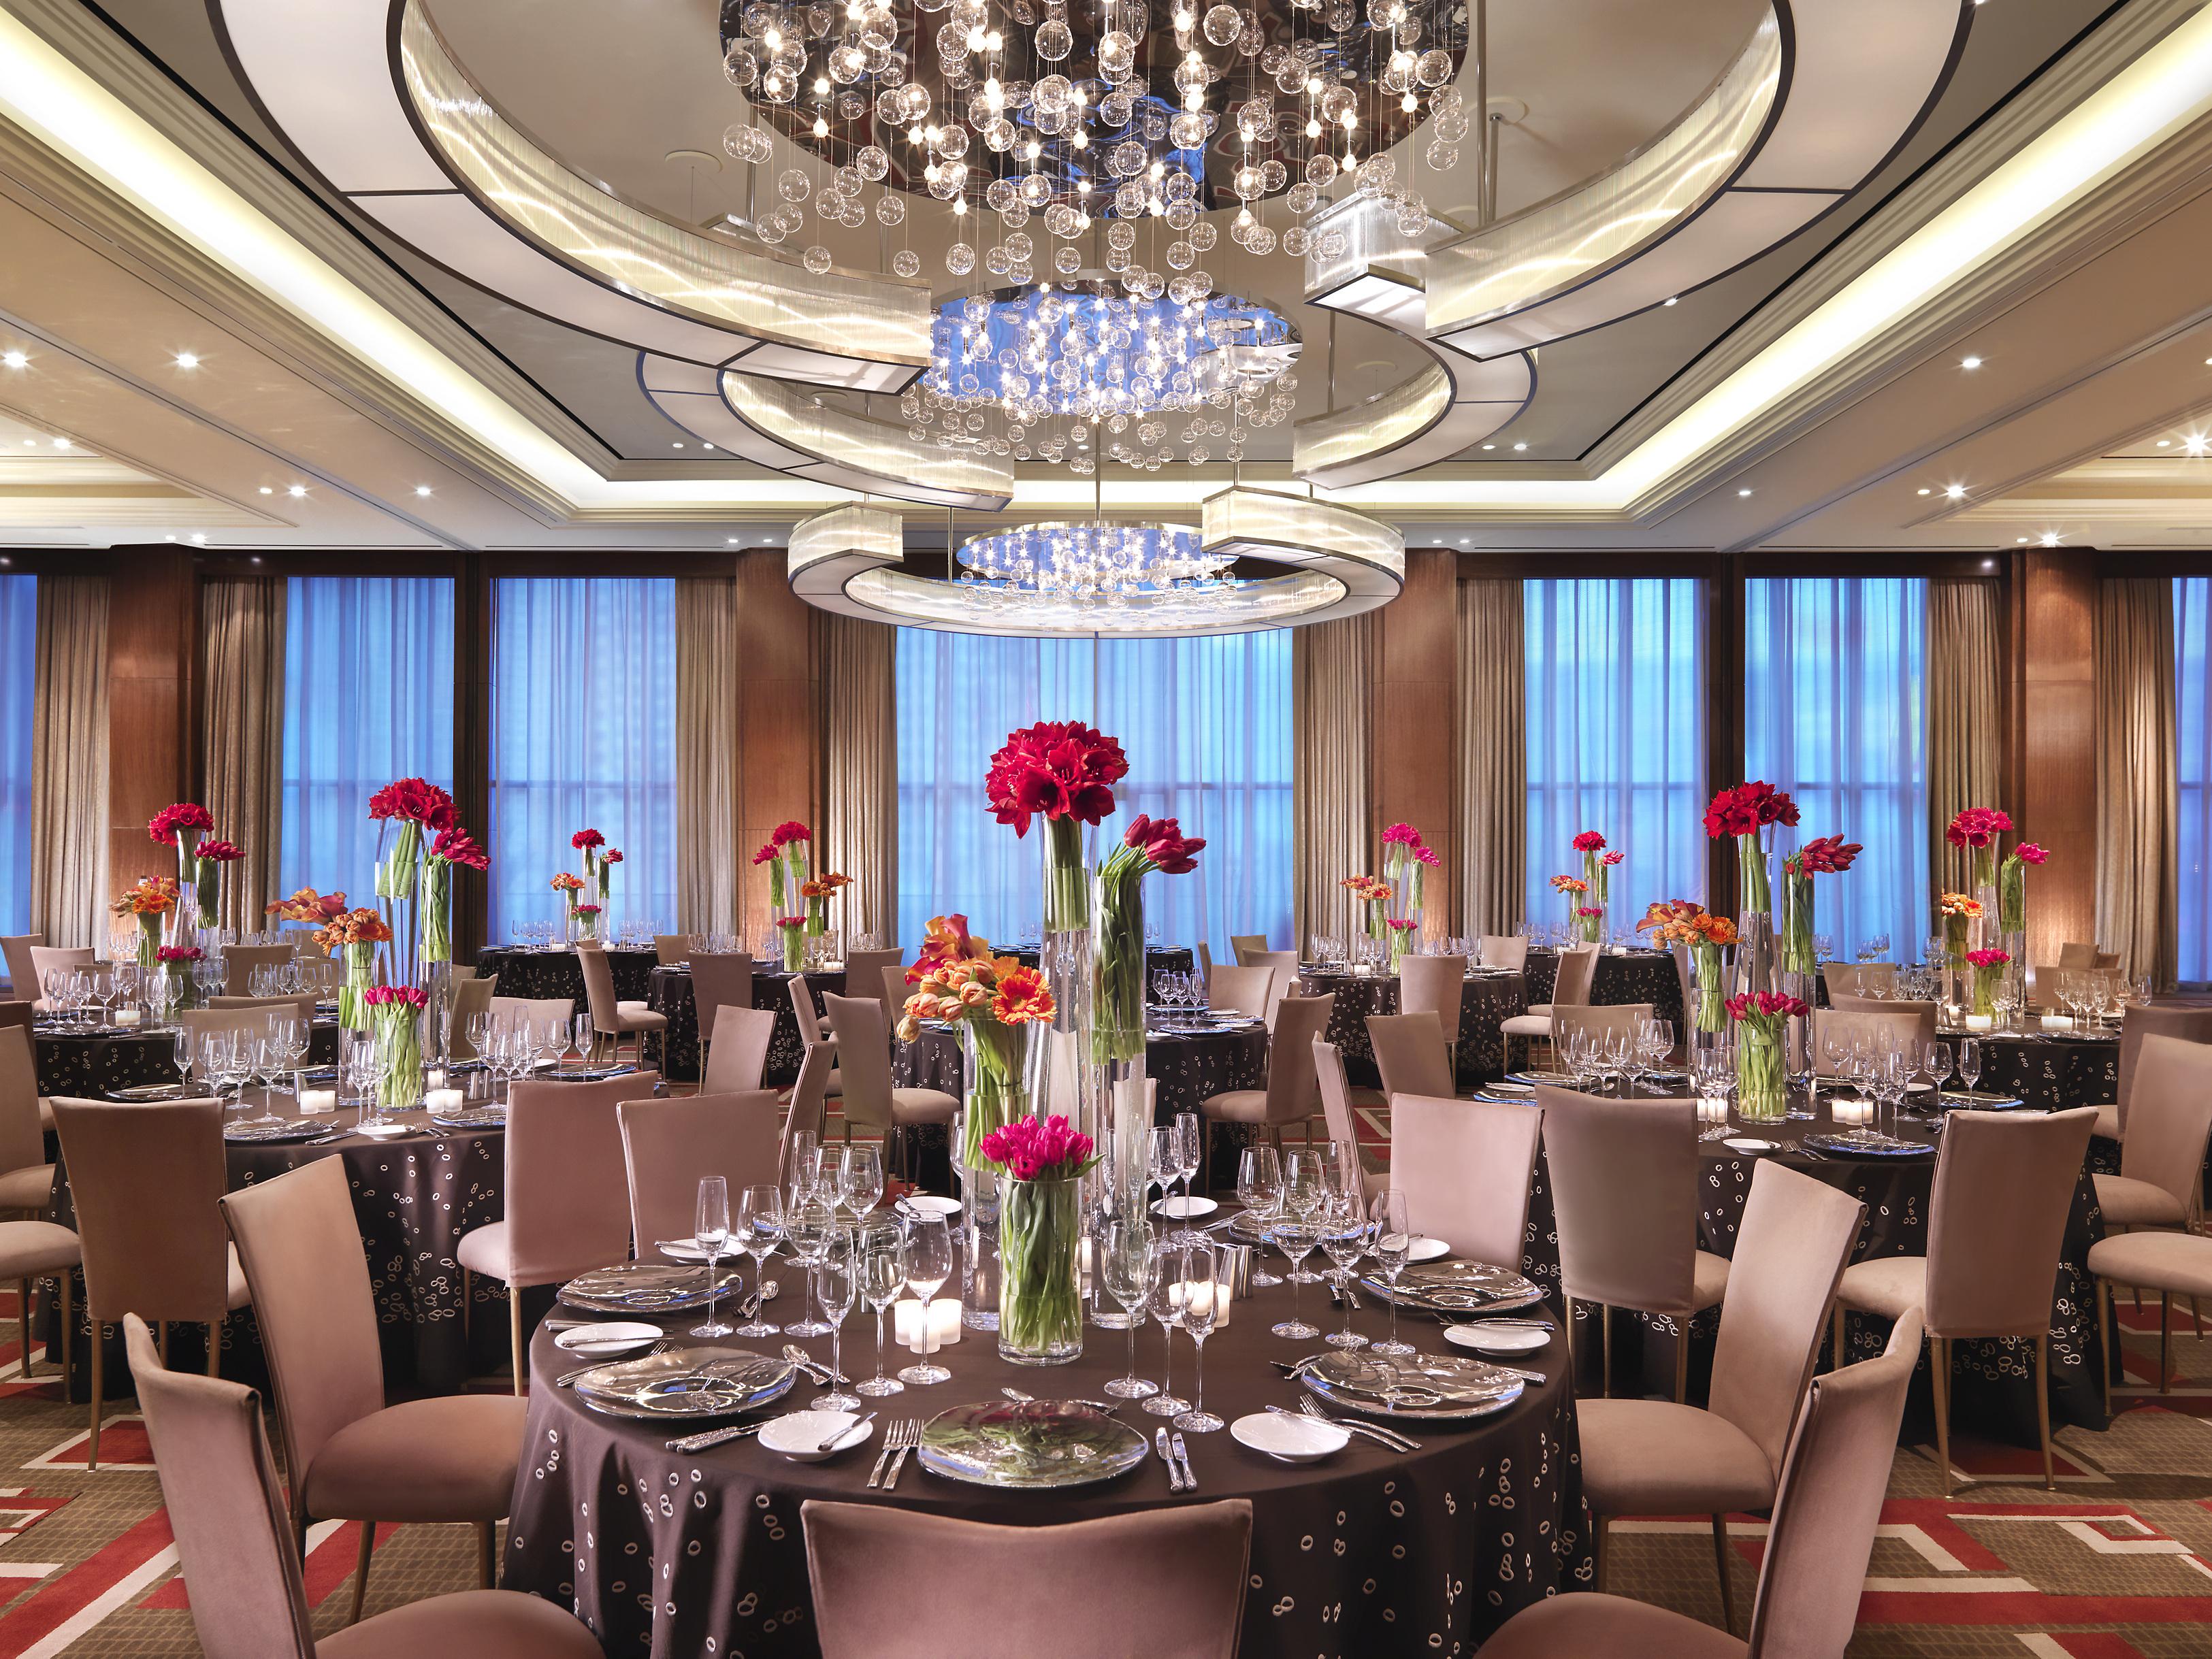 las-vegas-event-room-ballroom-banquet-tables-1